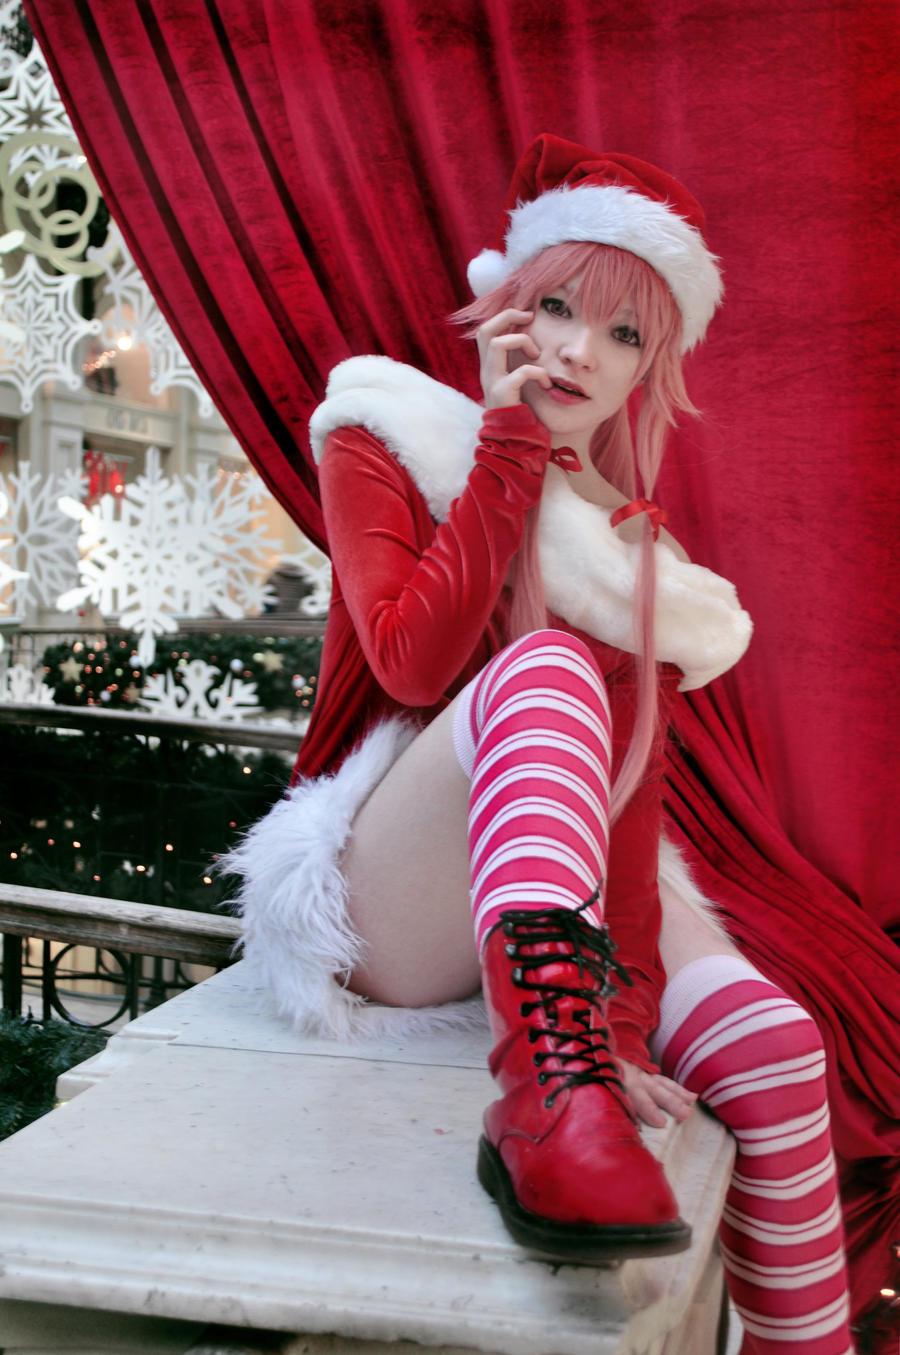 Yuno Merry Christmas by keito-nyan